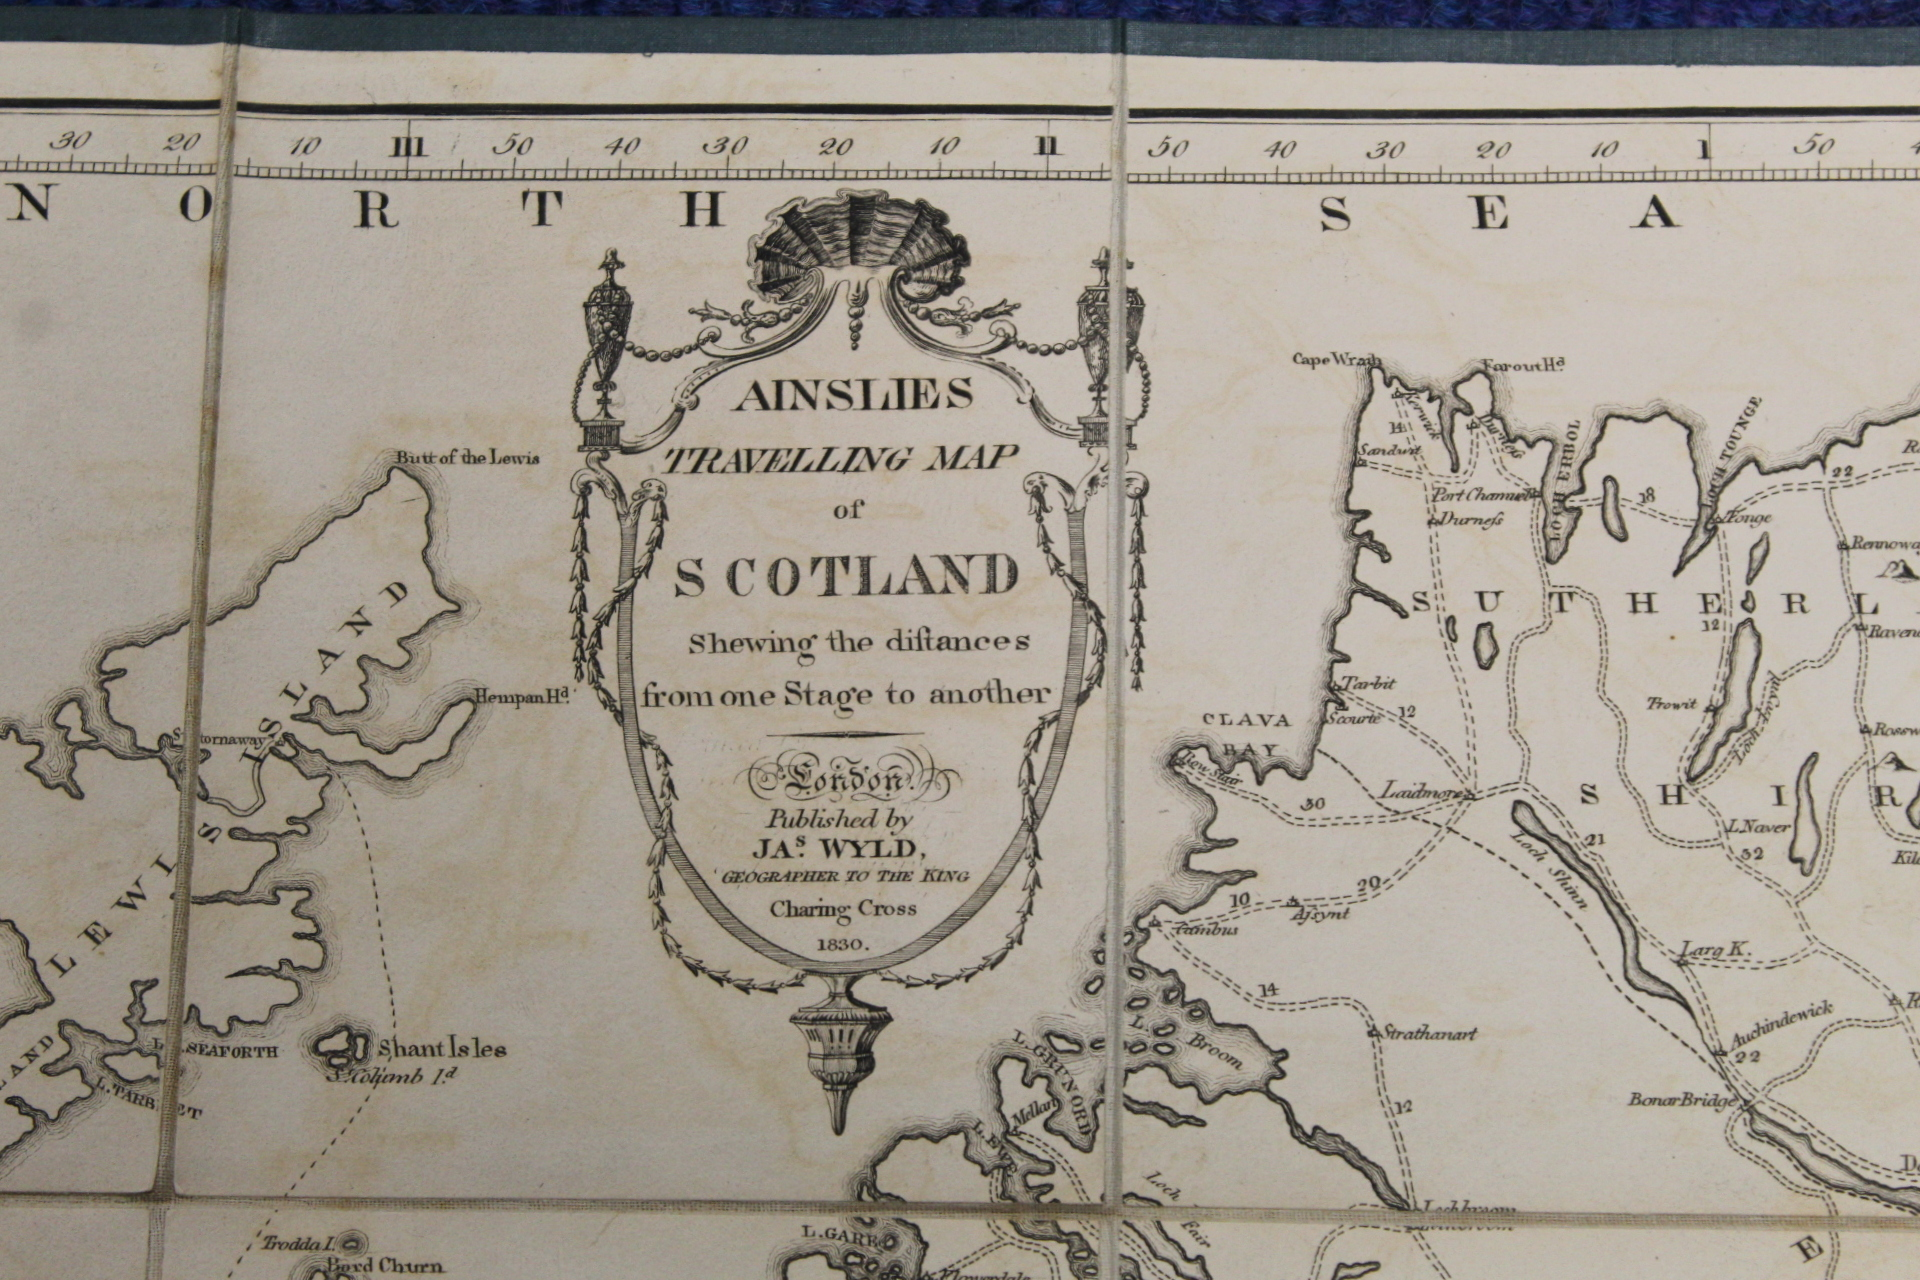 KIRKWOOD J. & SONS.Map of Scotland. Hand col. eng. fldg. linen map in well worn orig. slip case. - Image 28 of 36